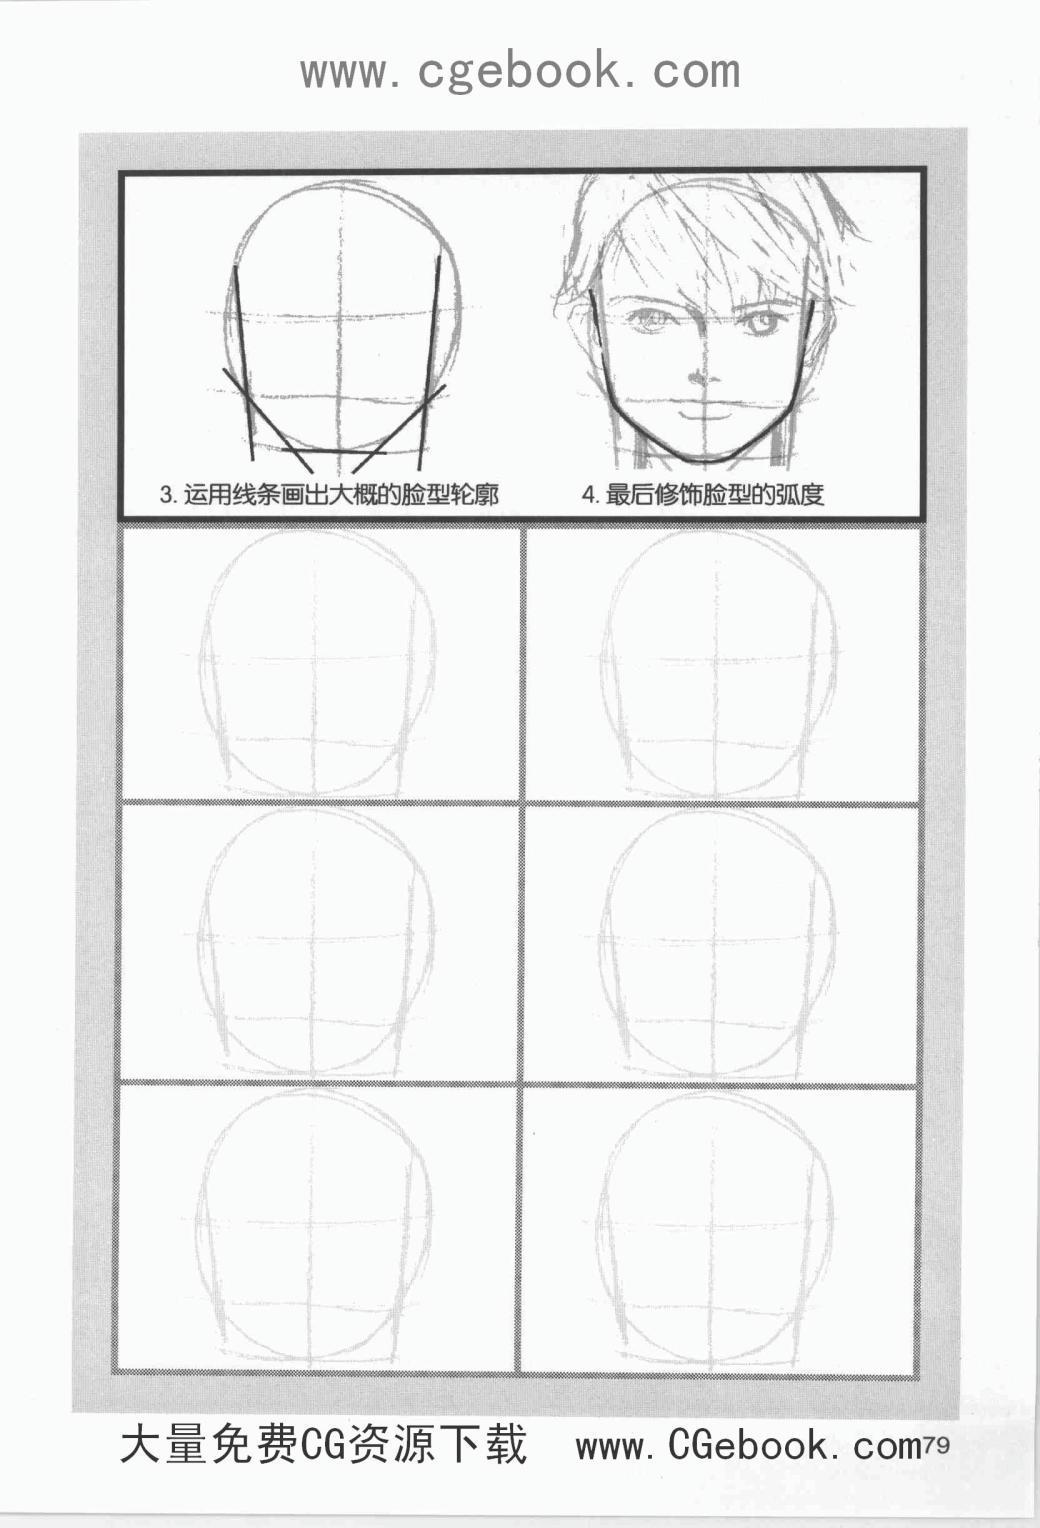 Cómo Dibujar Manga F457a4ji742yx7jfg